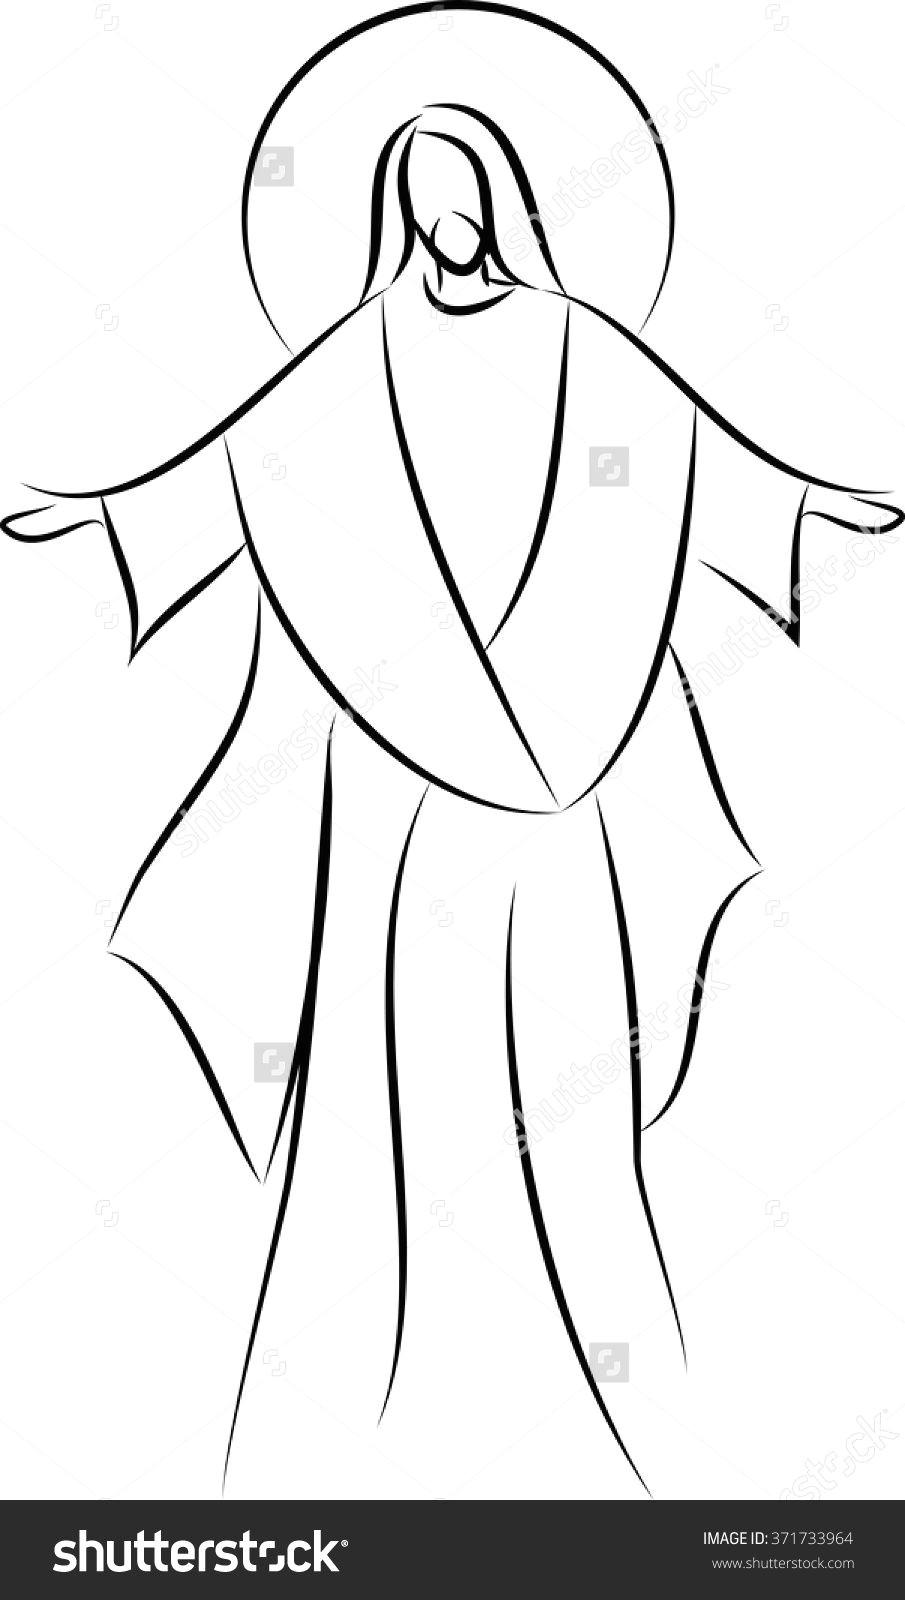 pin od zofia morua na wzory do techniki pergaminowej christ jesus christ i drawings